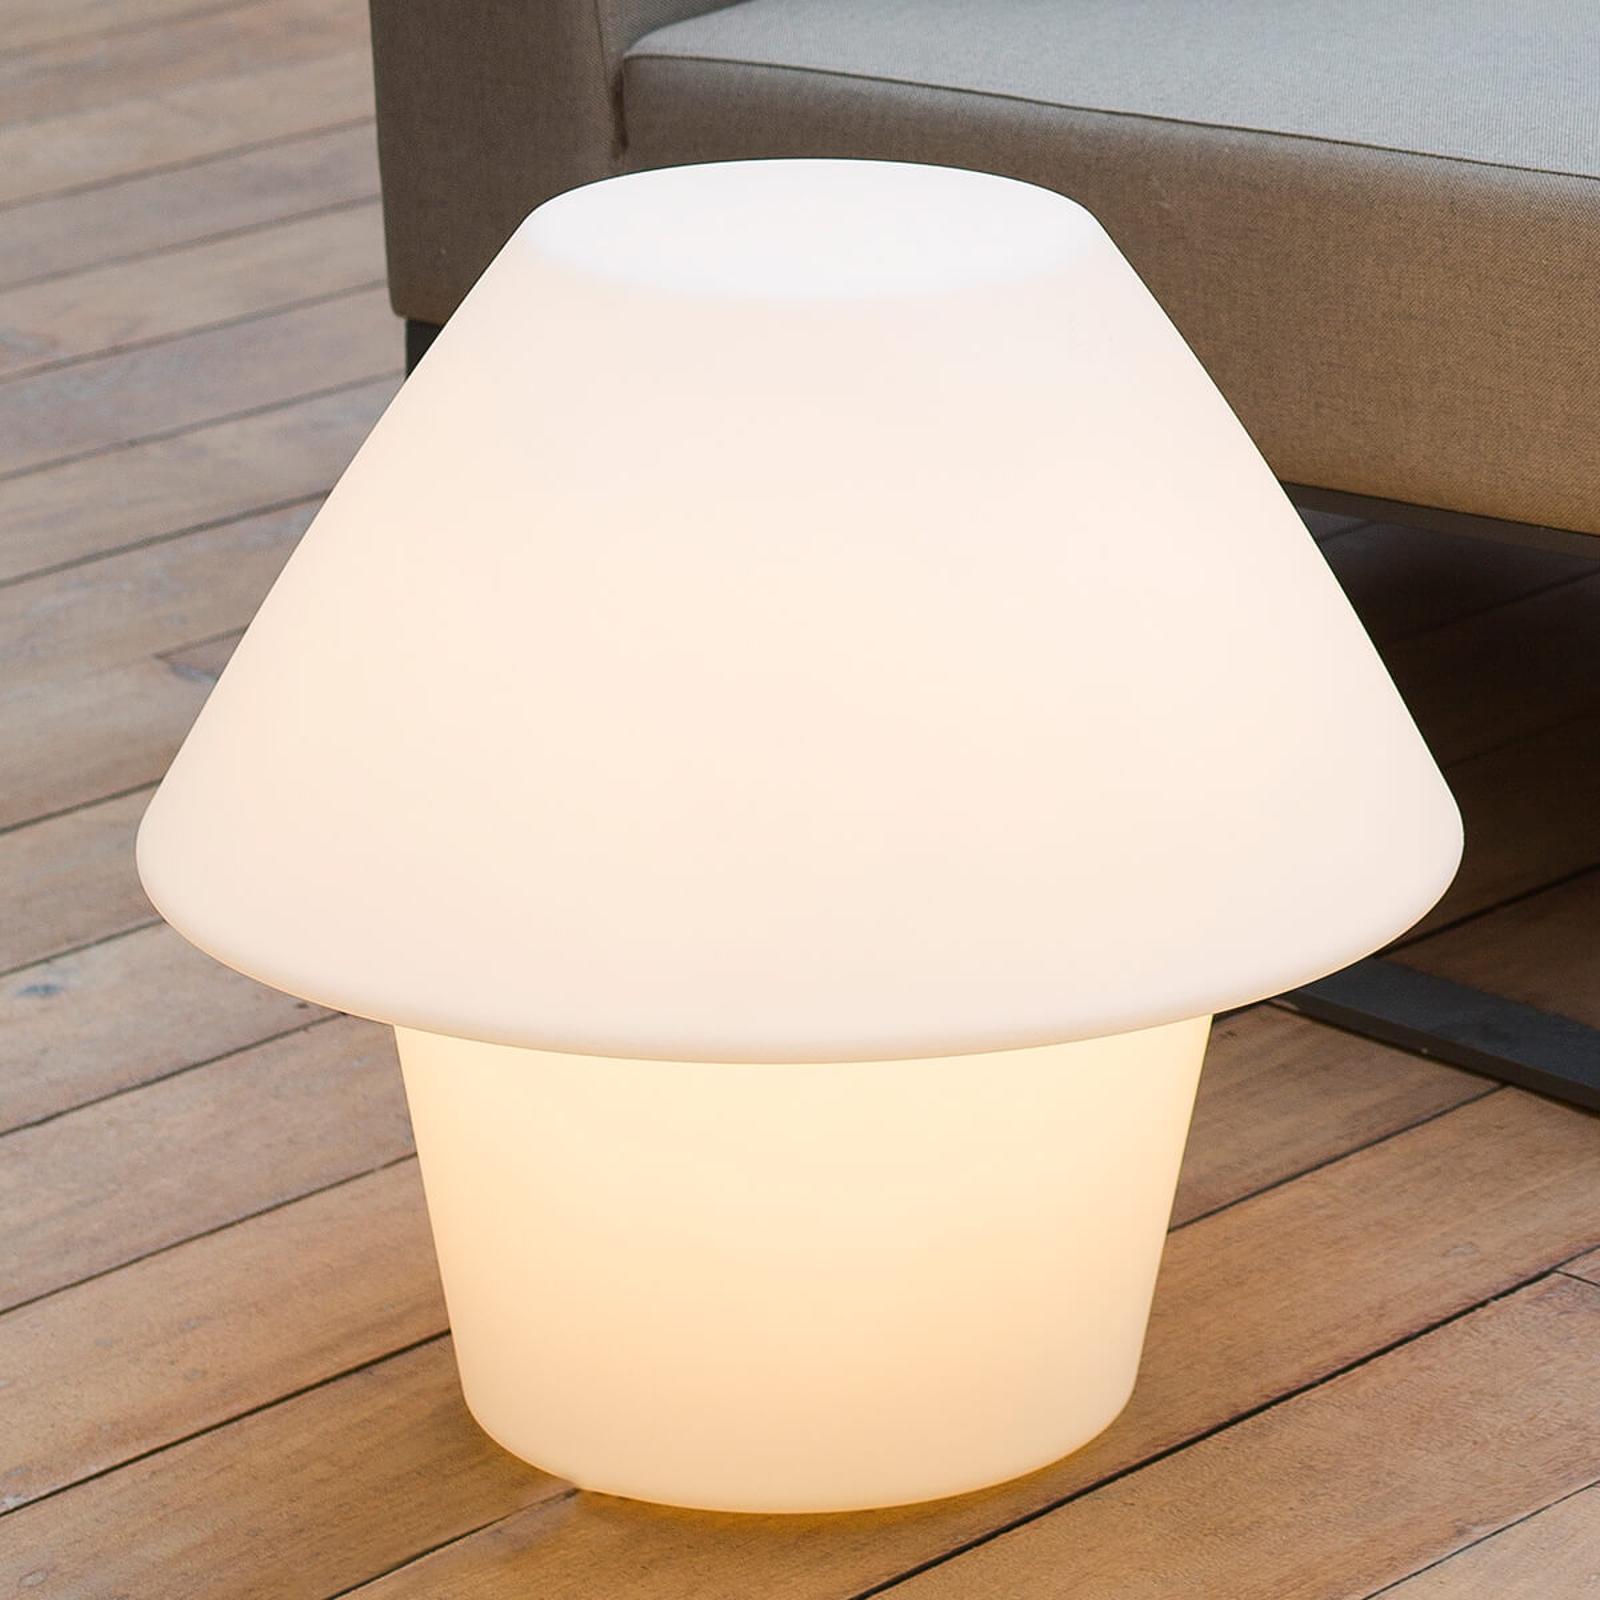 Zewnętrzna lampa dekoracyjna Versus